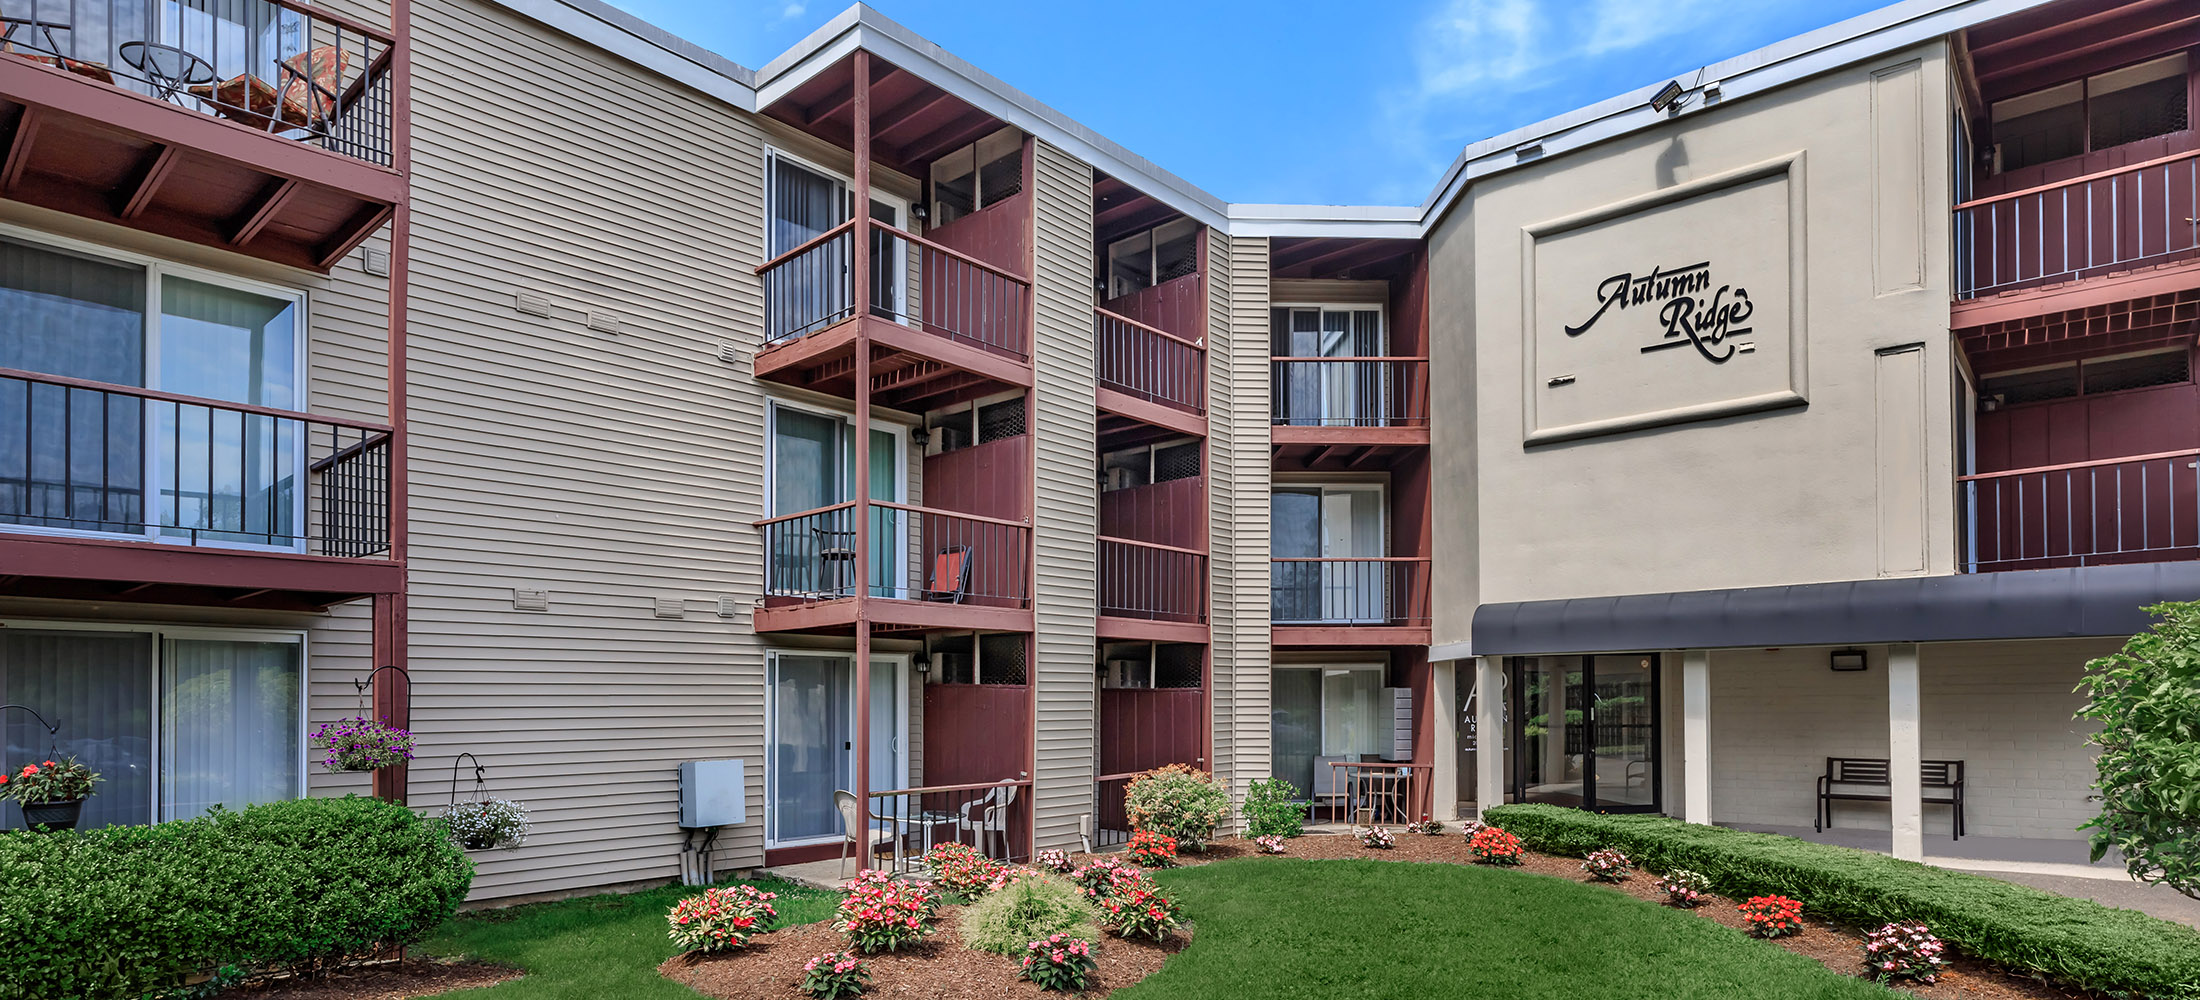 autumn ridge apartments in east haven ct